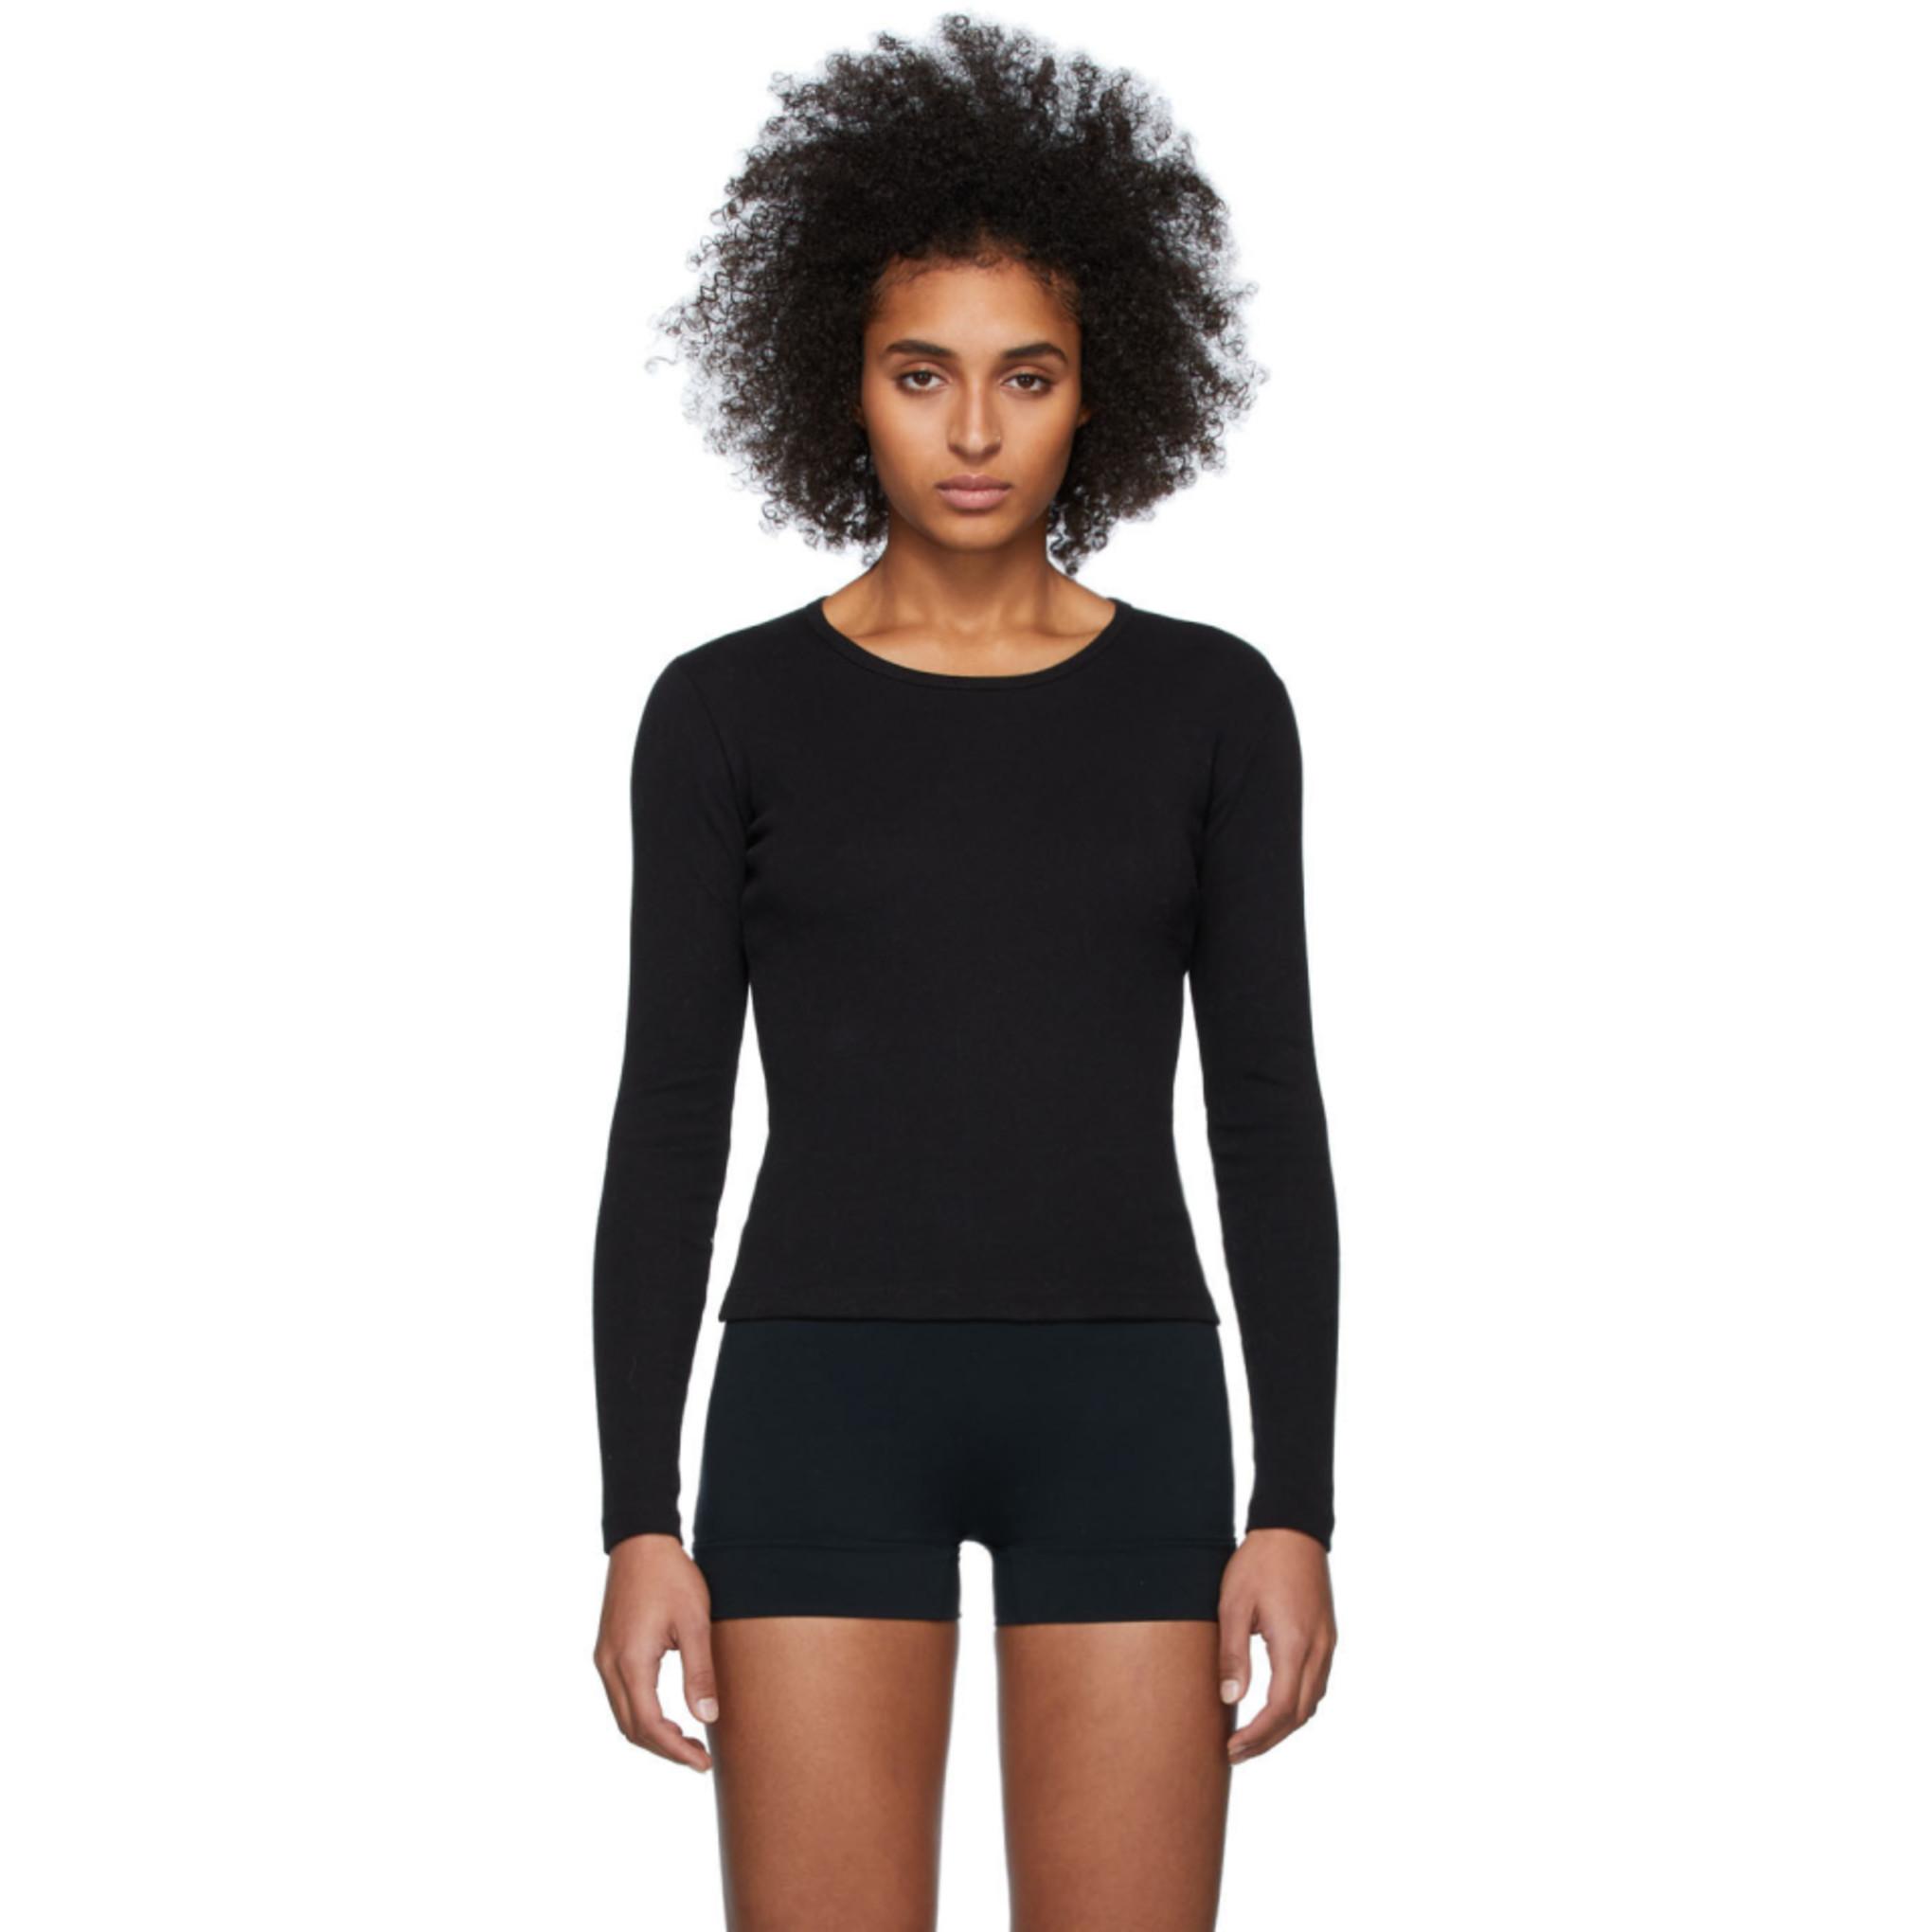 Black Bellevue Long Sleeve T Shirt by Gil Rodriguez